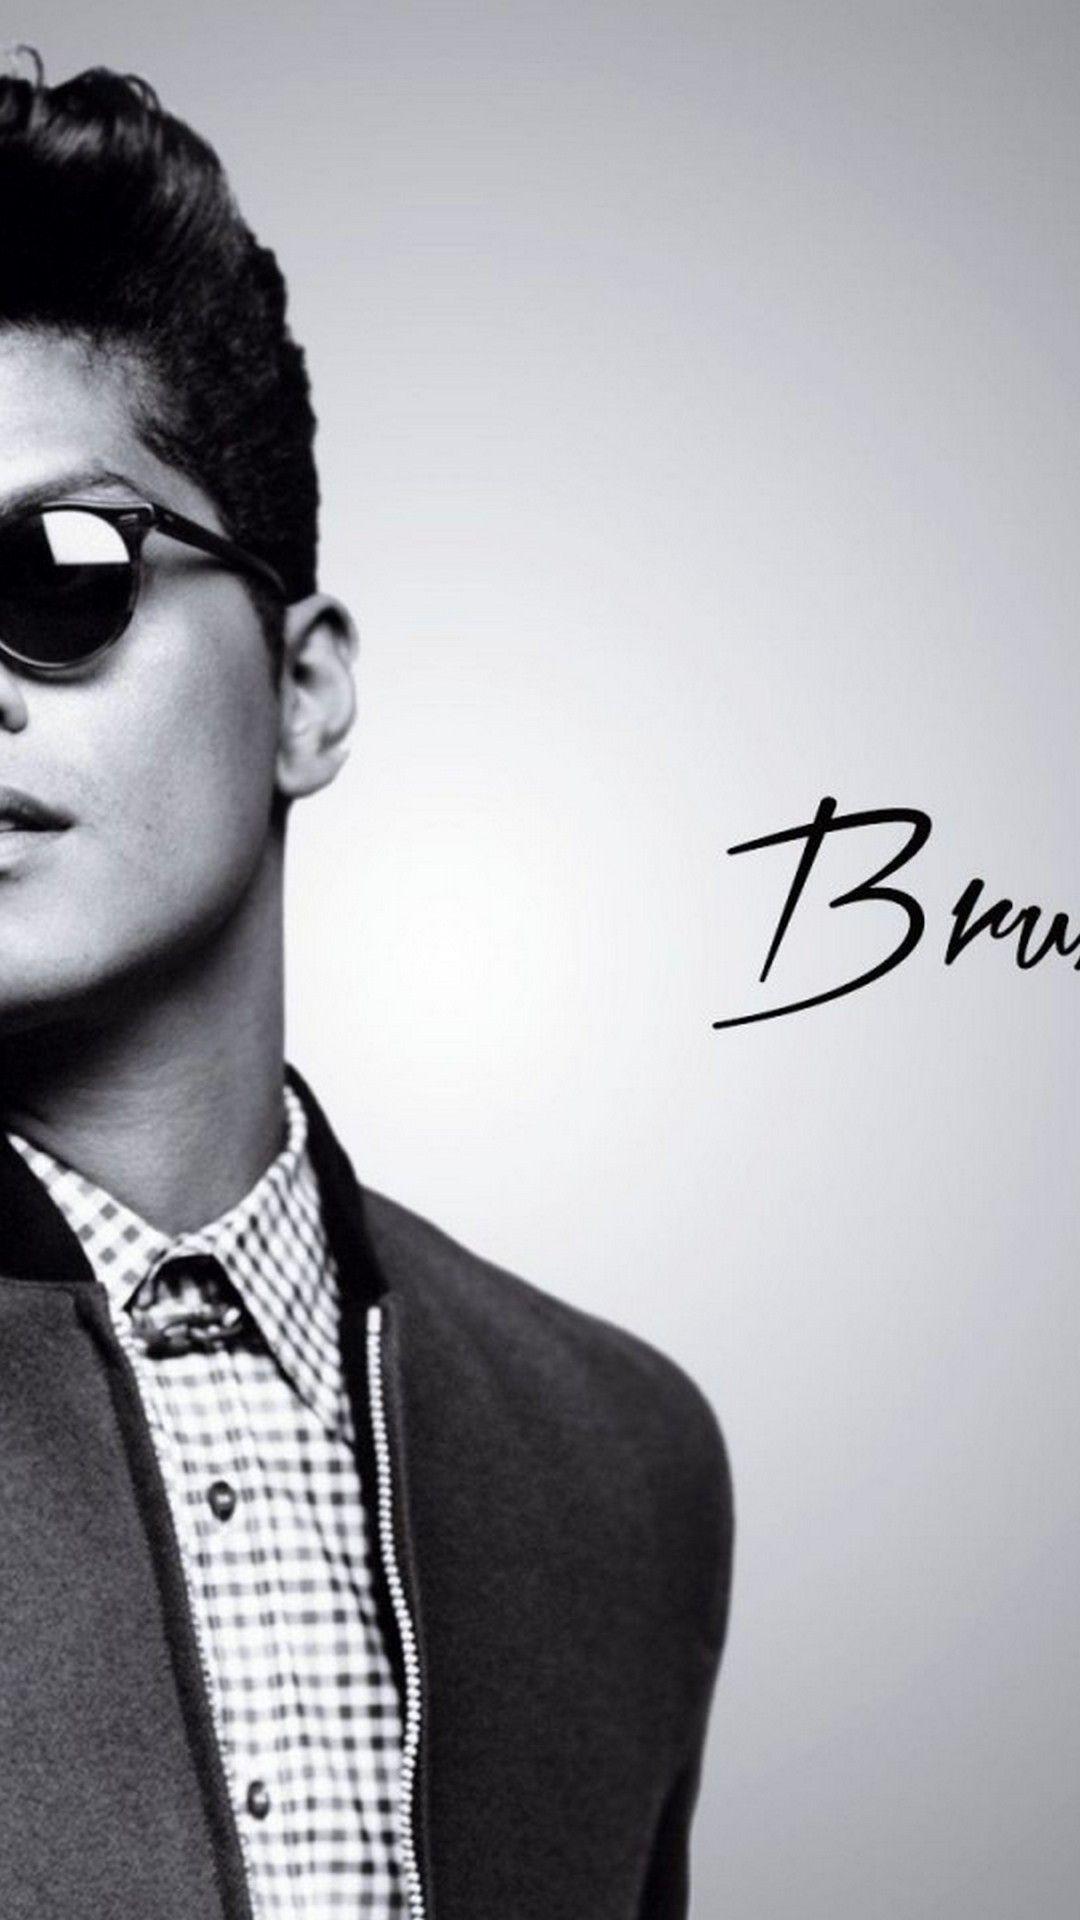 Bruno Mars Wallpaper For Iphone Best Iphone Wallpaper Mars Wallpaper Bruno Mars Mars